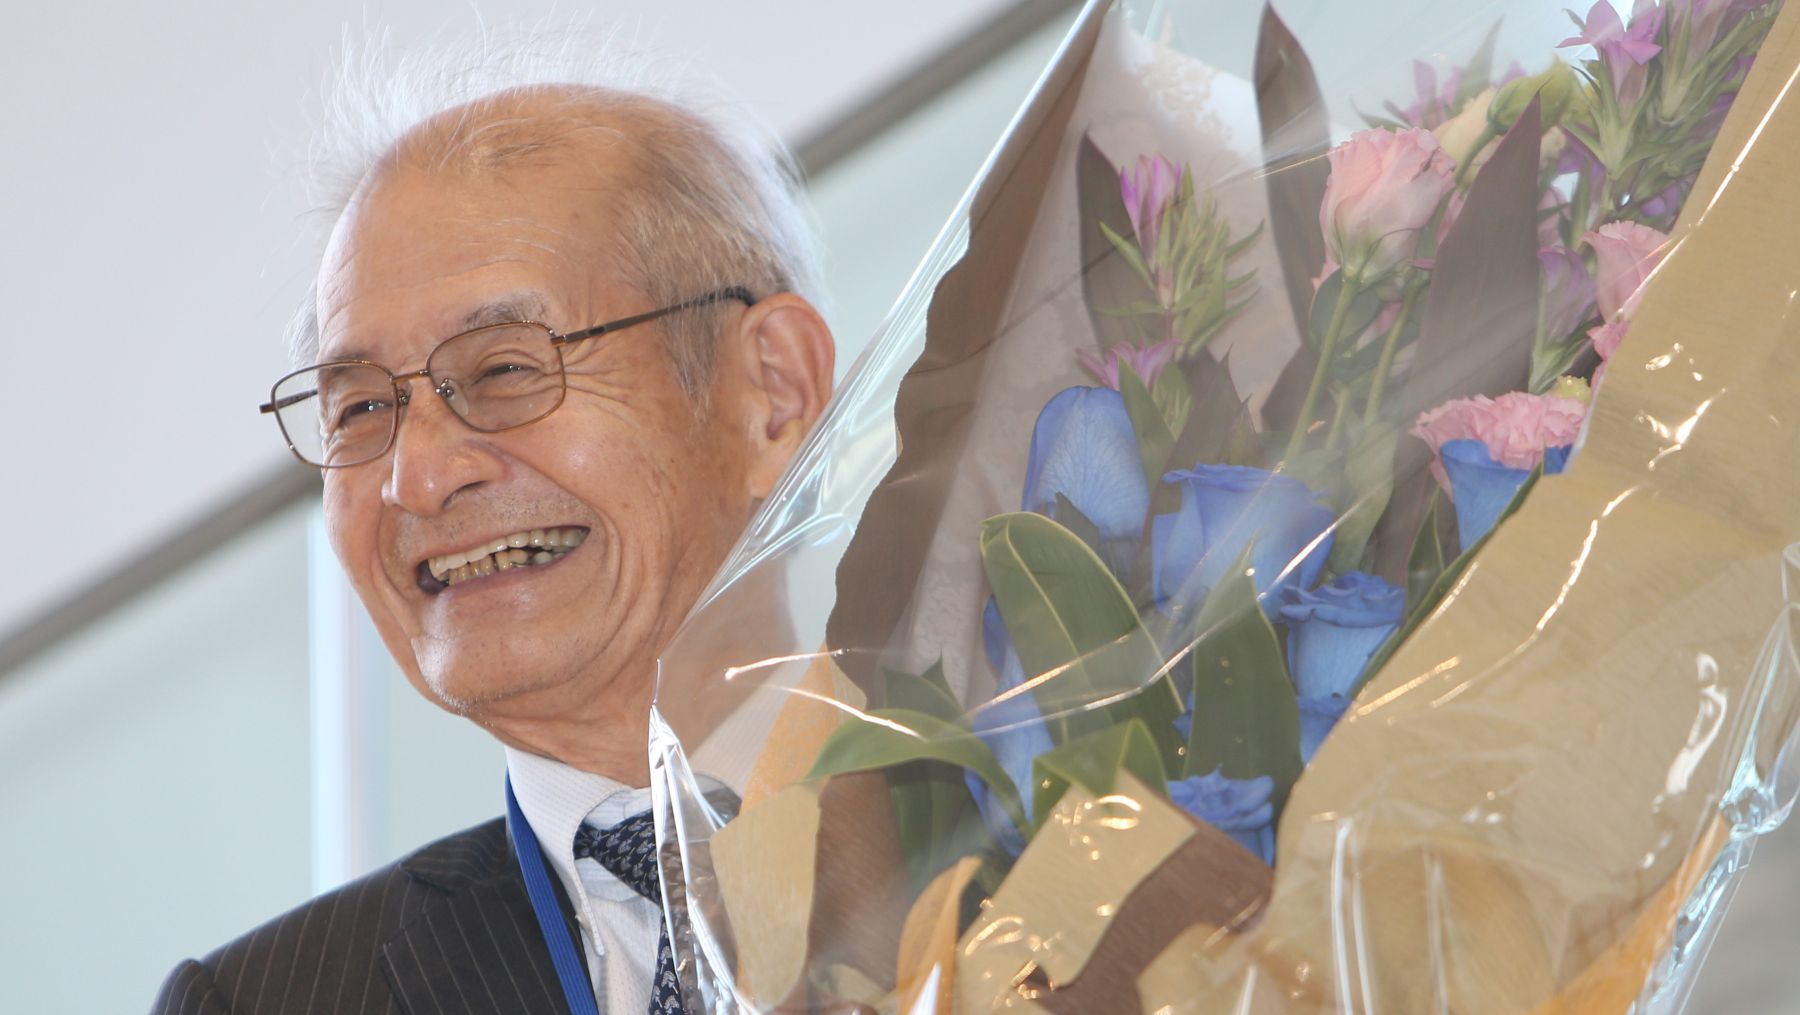 Japanese Akira Yoshino Shares 2019 Nobel Prize in Chemistry Toward a Wireless, Fossil Fuel-Free Society 003